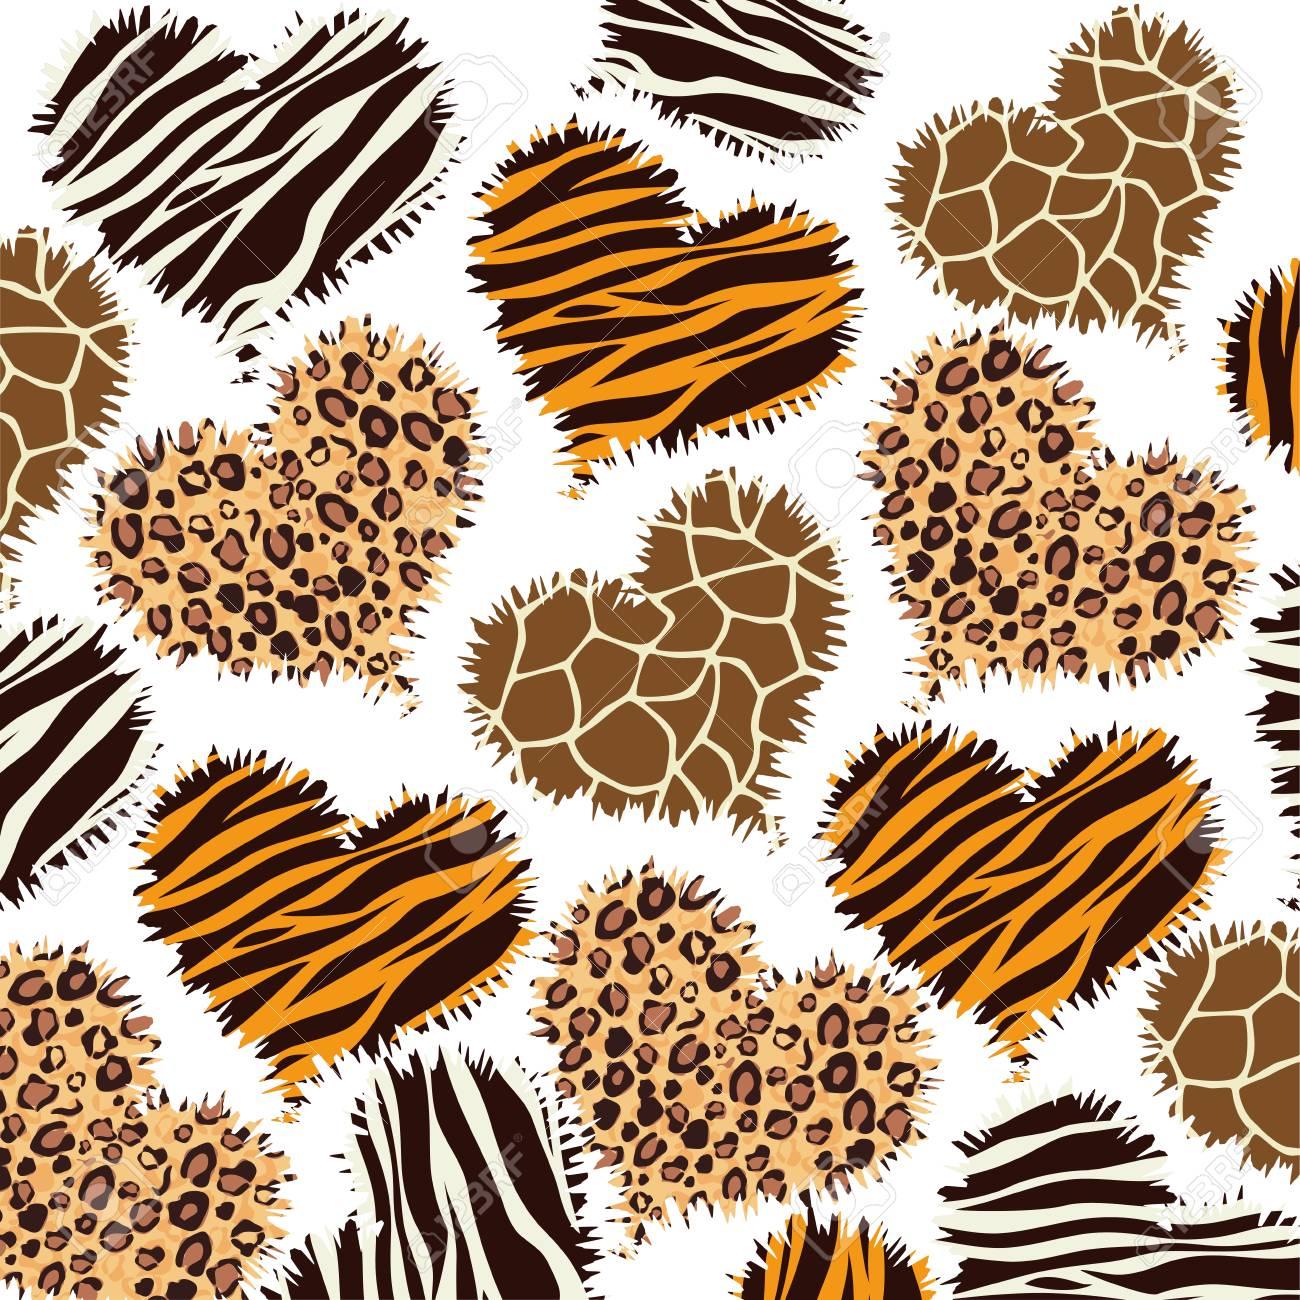 Reco Animal Print